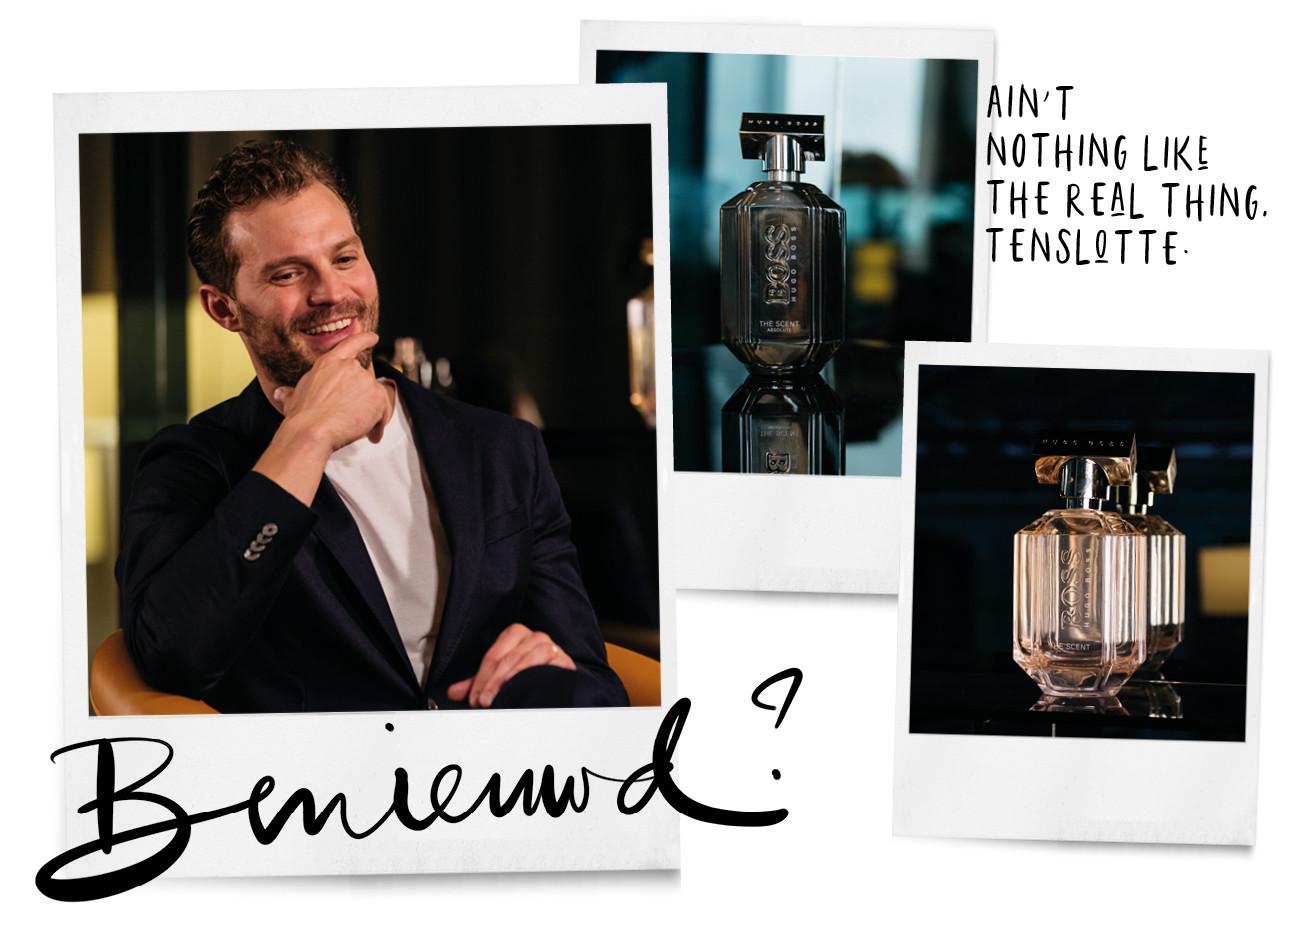 jamie dornan met naast hem de parfums van hugo boss